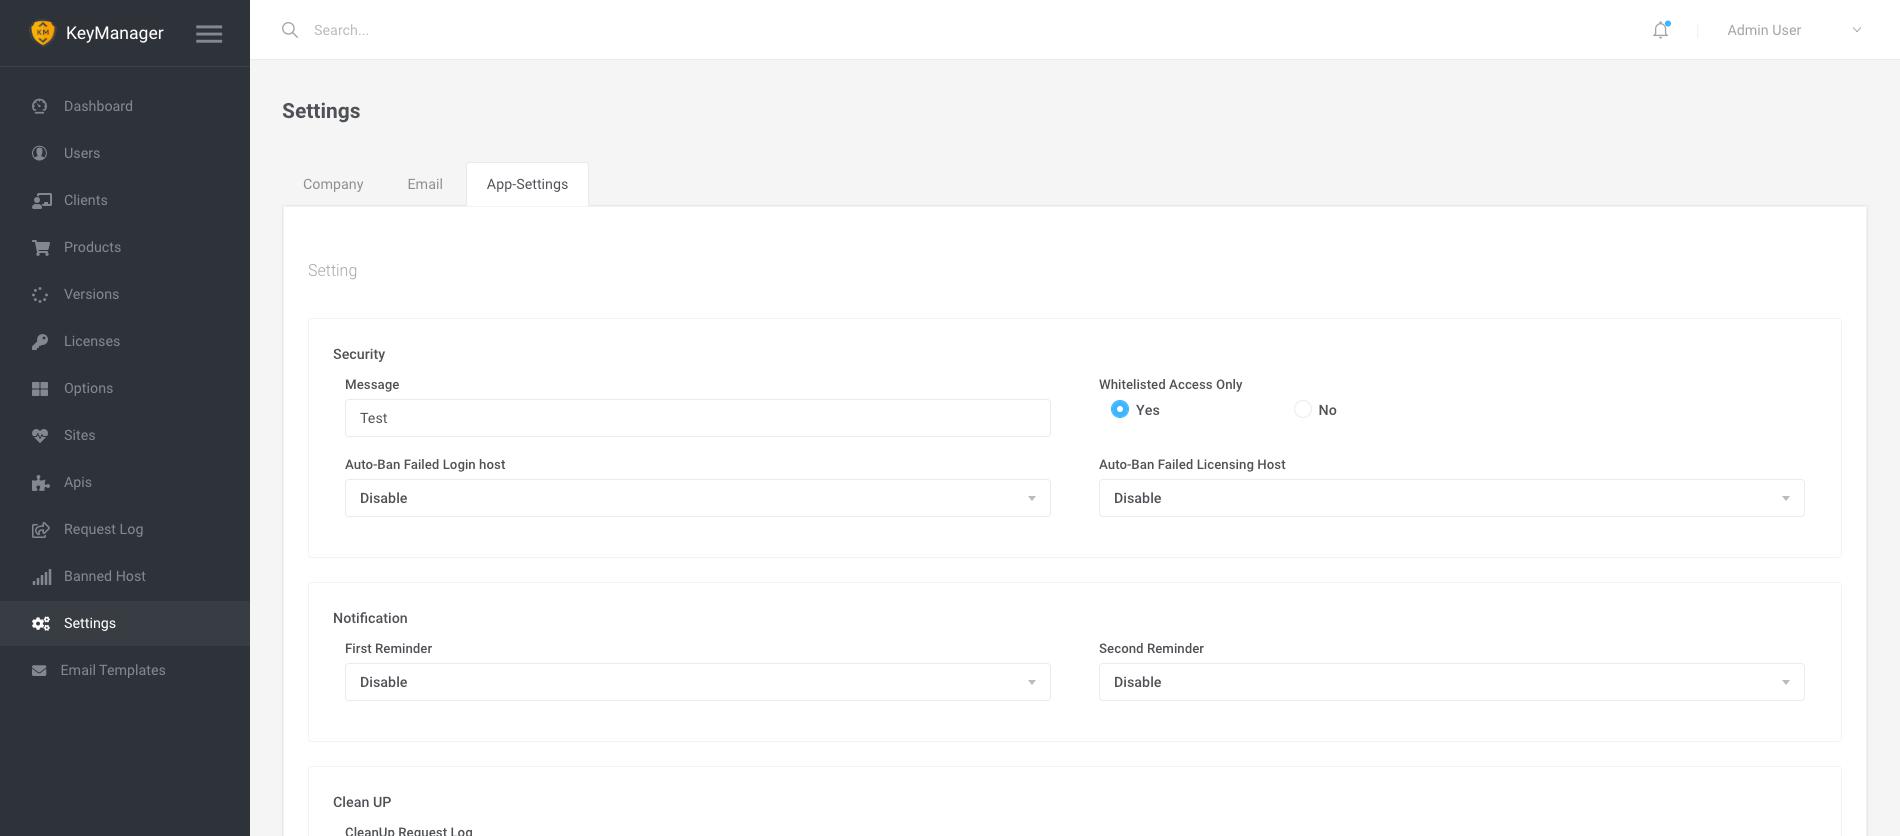 screencapture-demo-getkeymanager-settings-index-2019-10-05-15_43_05